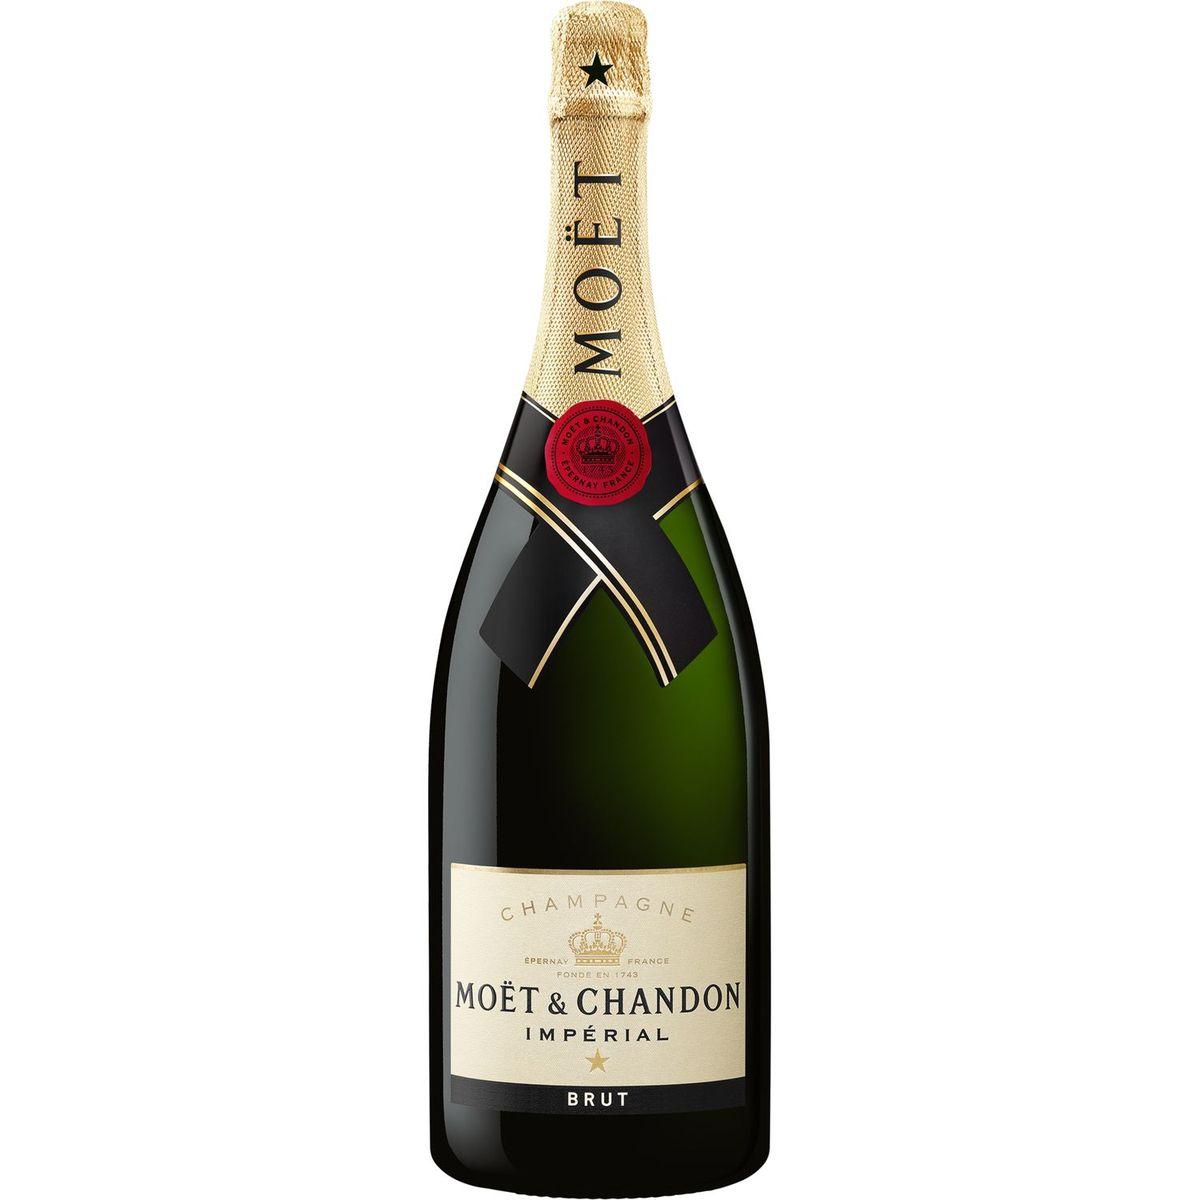 AOP Champagne brut impérial